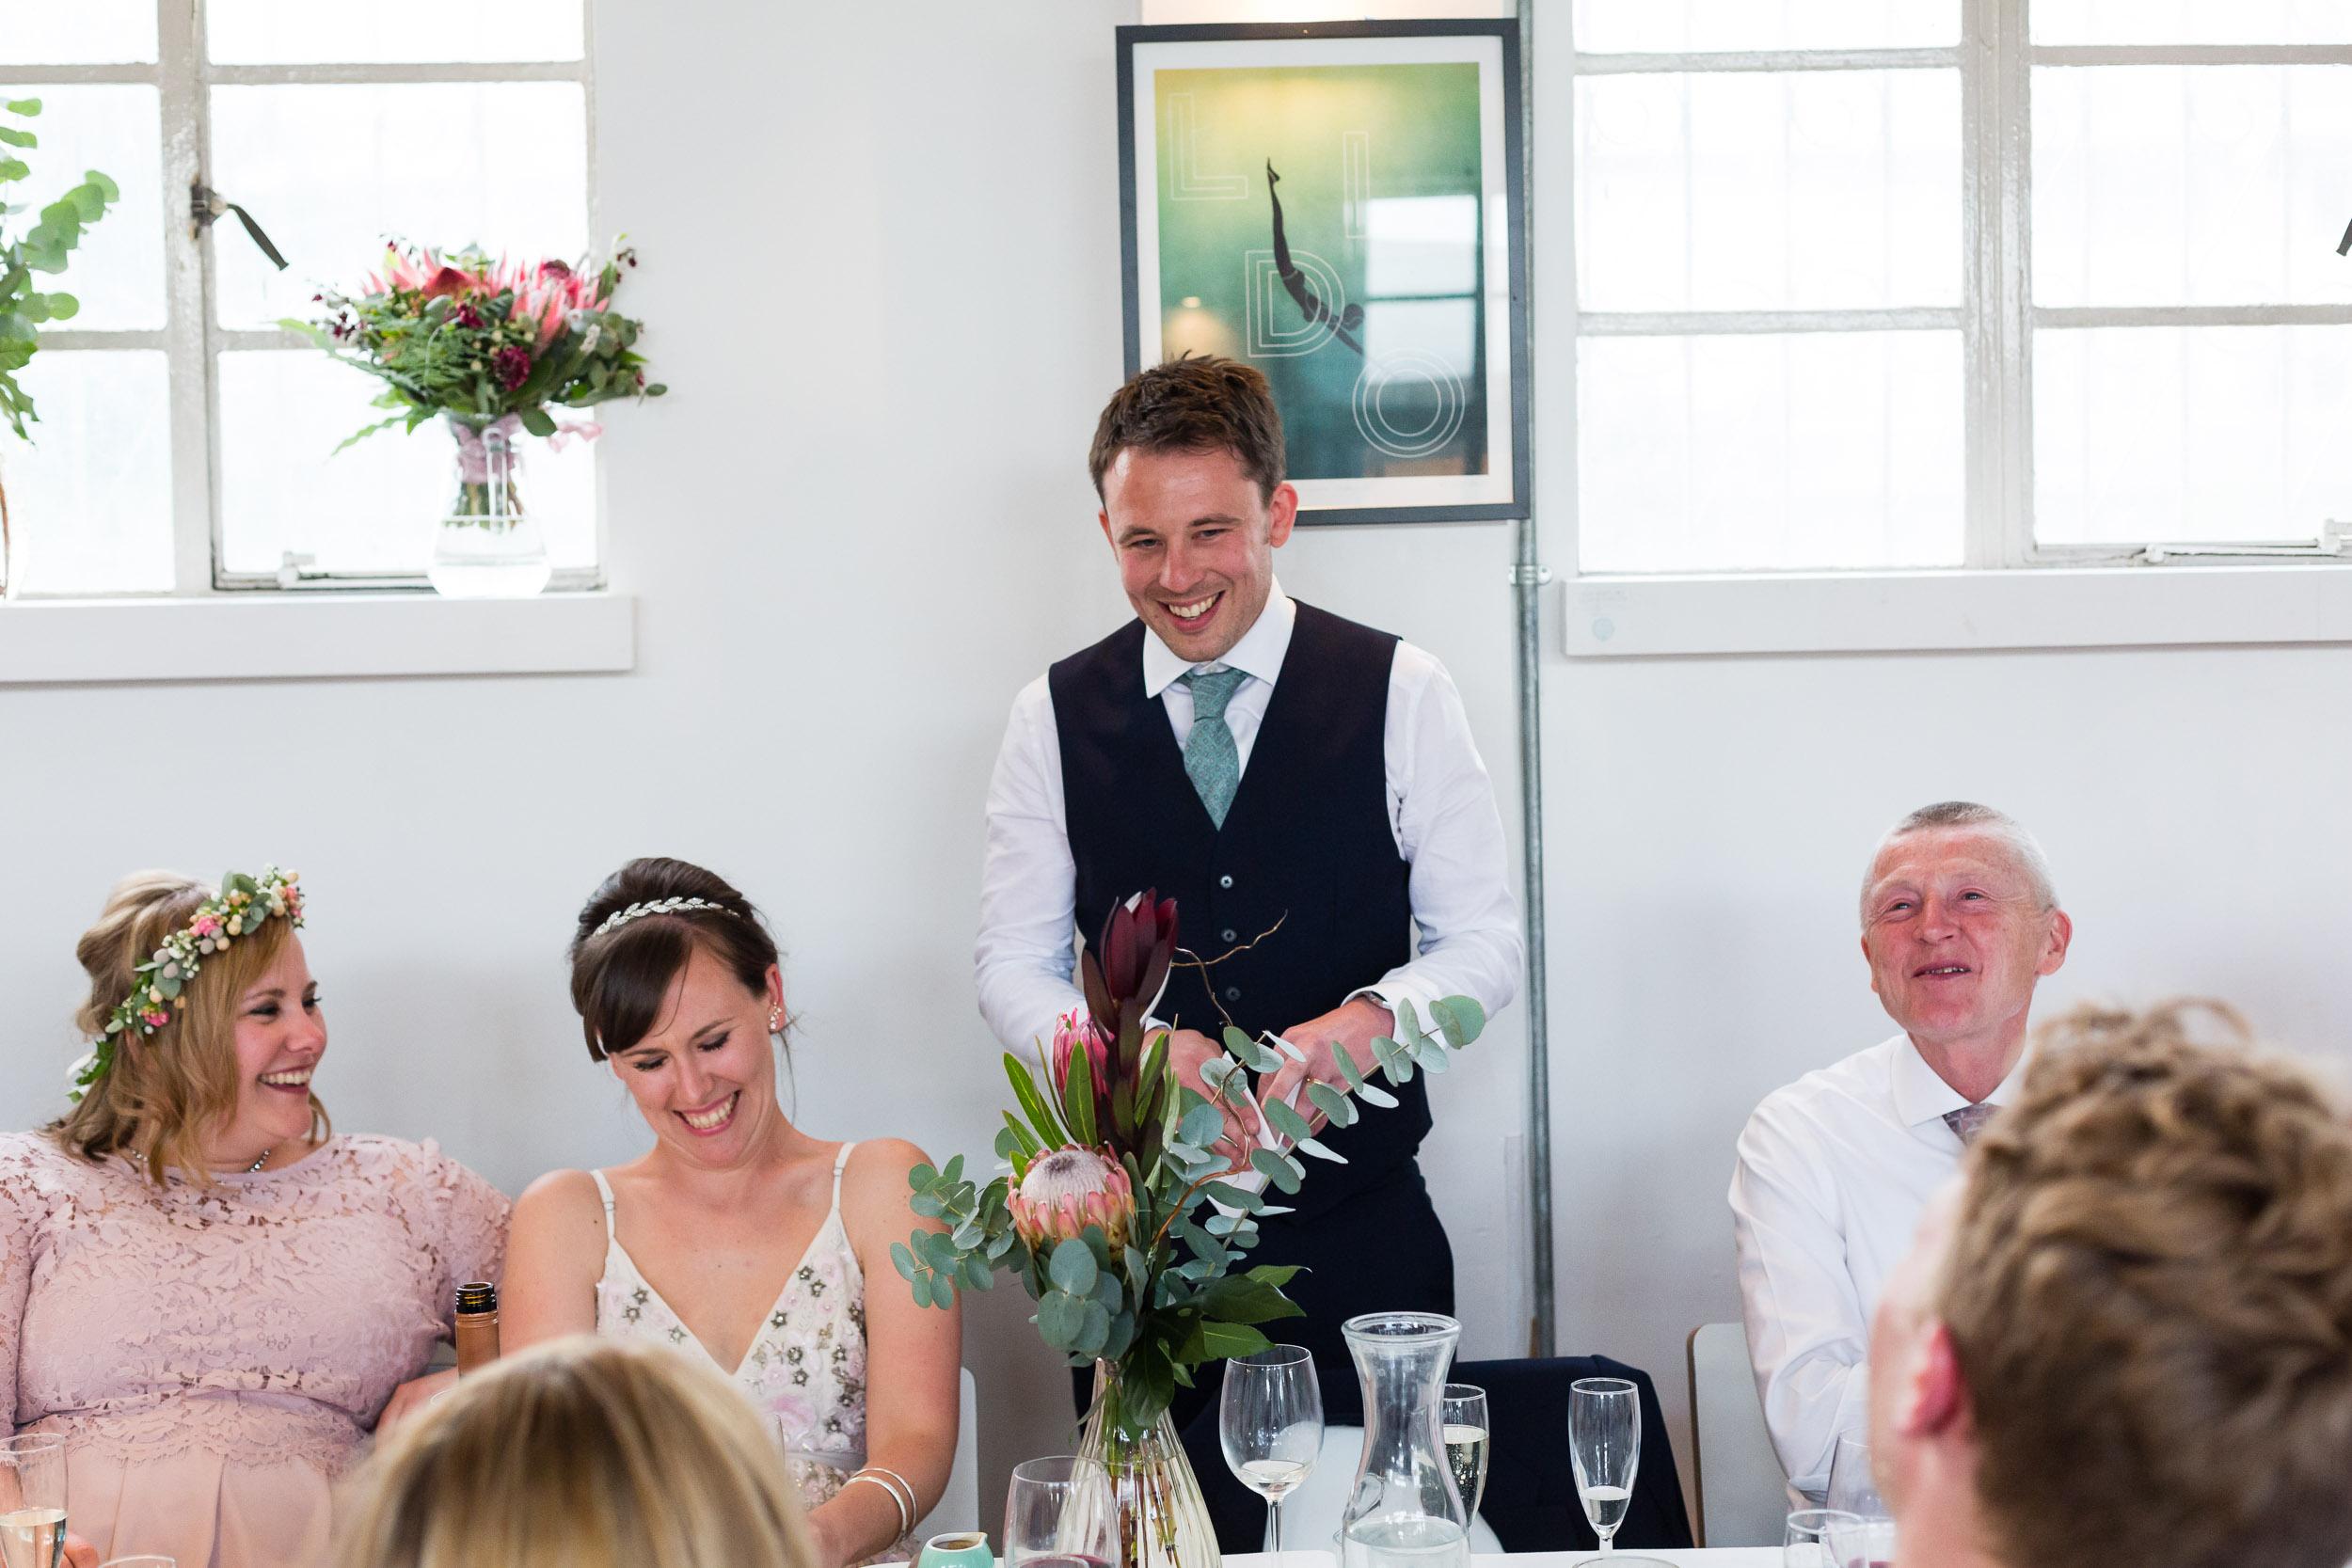 brockwell-lido-brixton-herne-hill-wedding-340.jpg